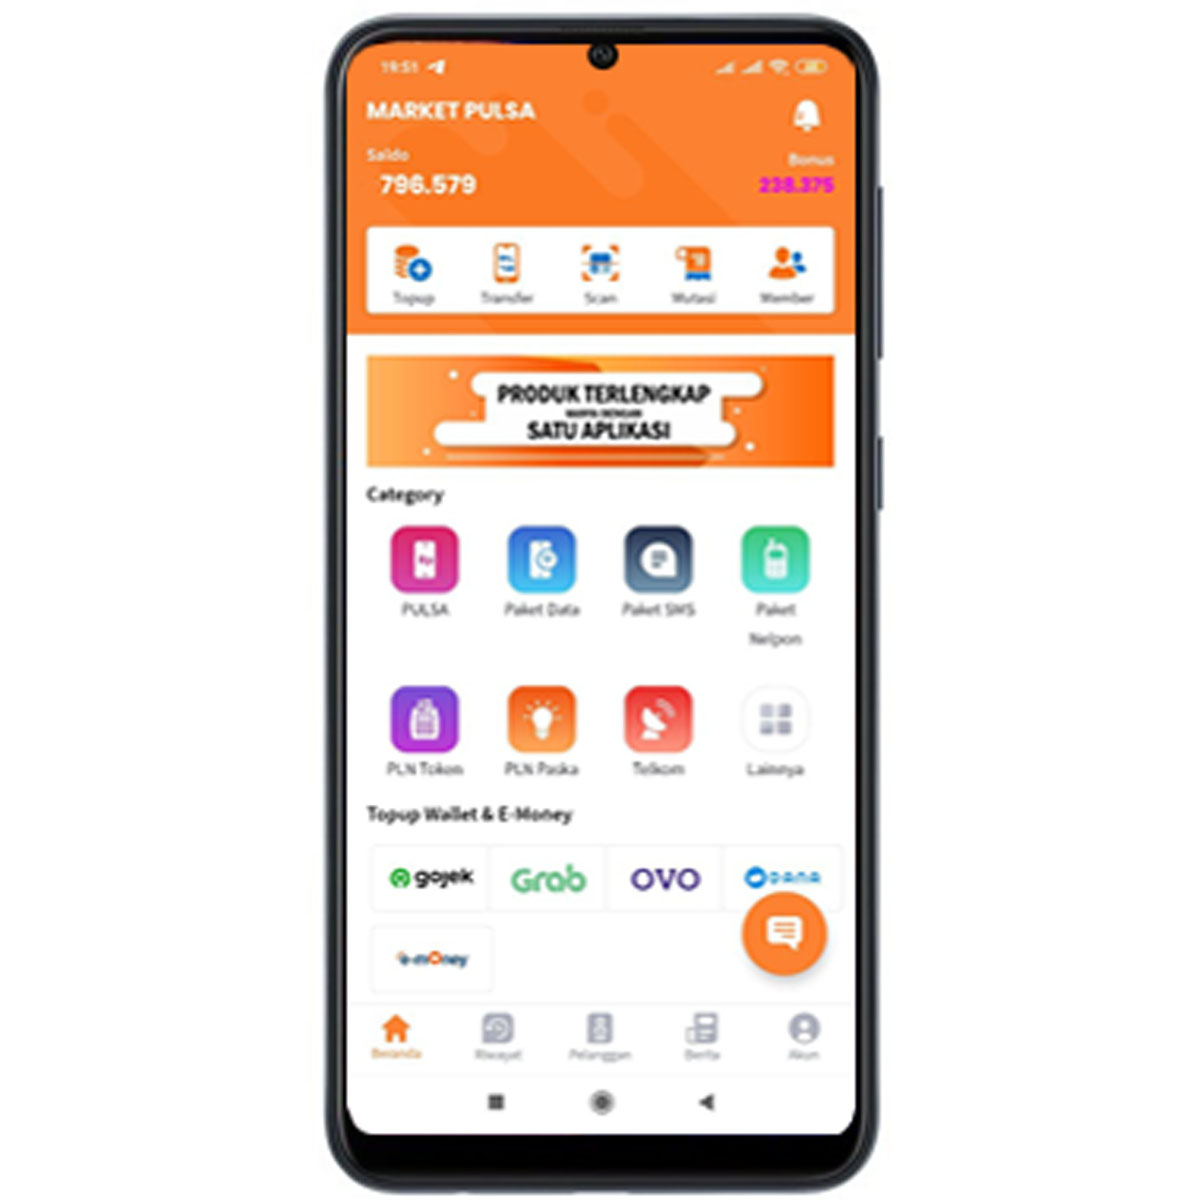 Apk Android Market Pulsa Data